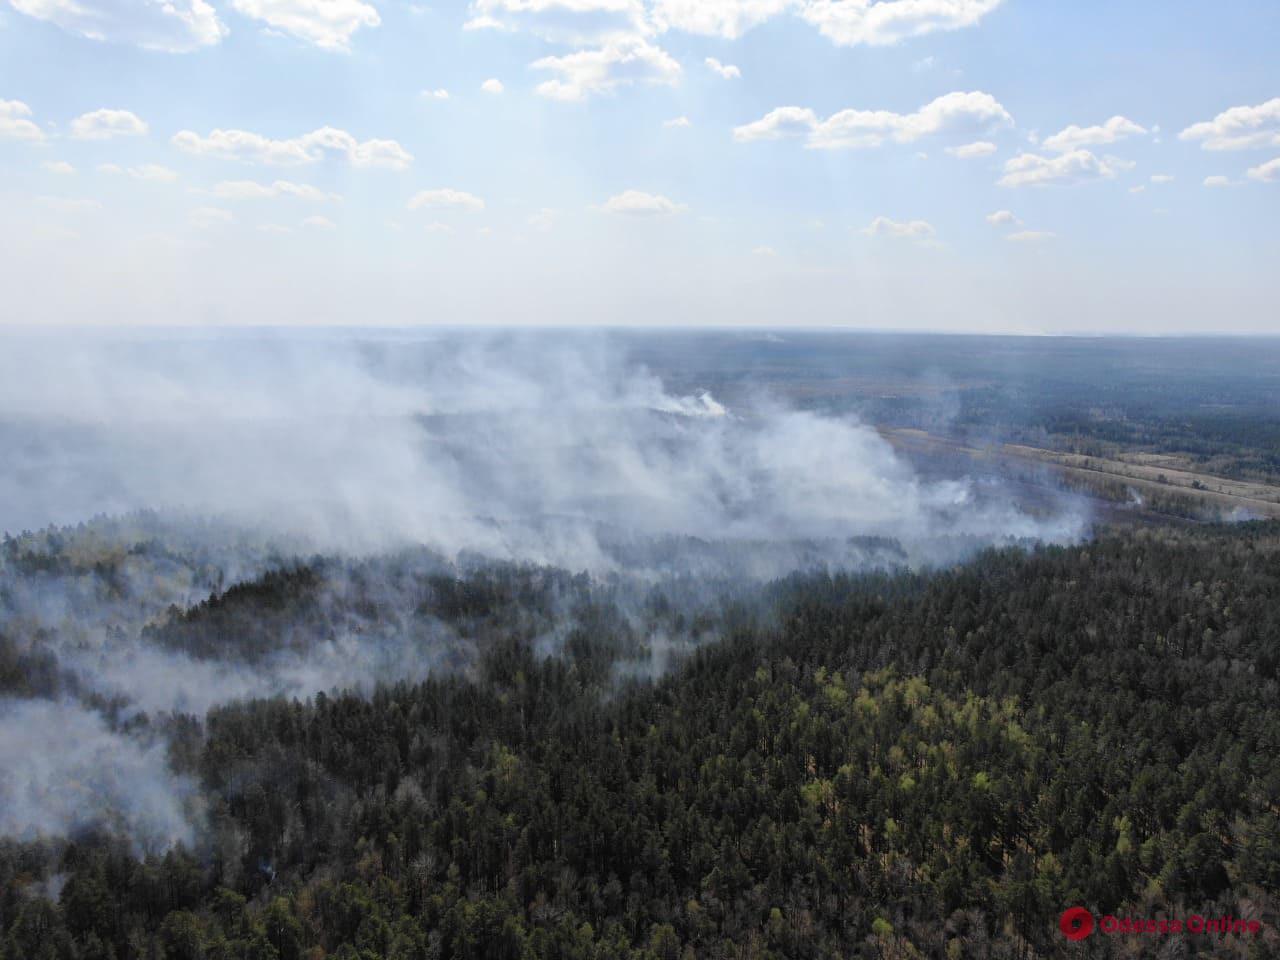 В Житомирской области снова горят леса (фото, видео)